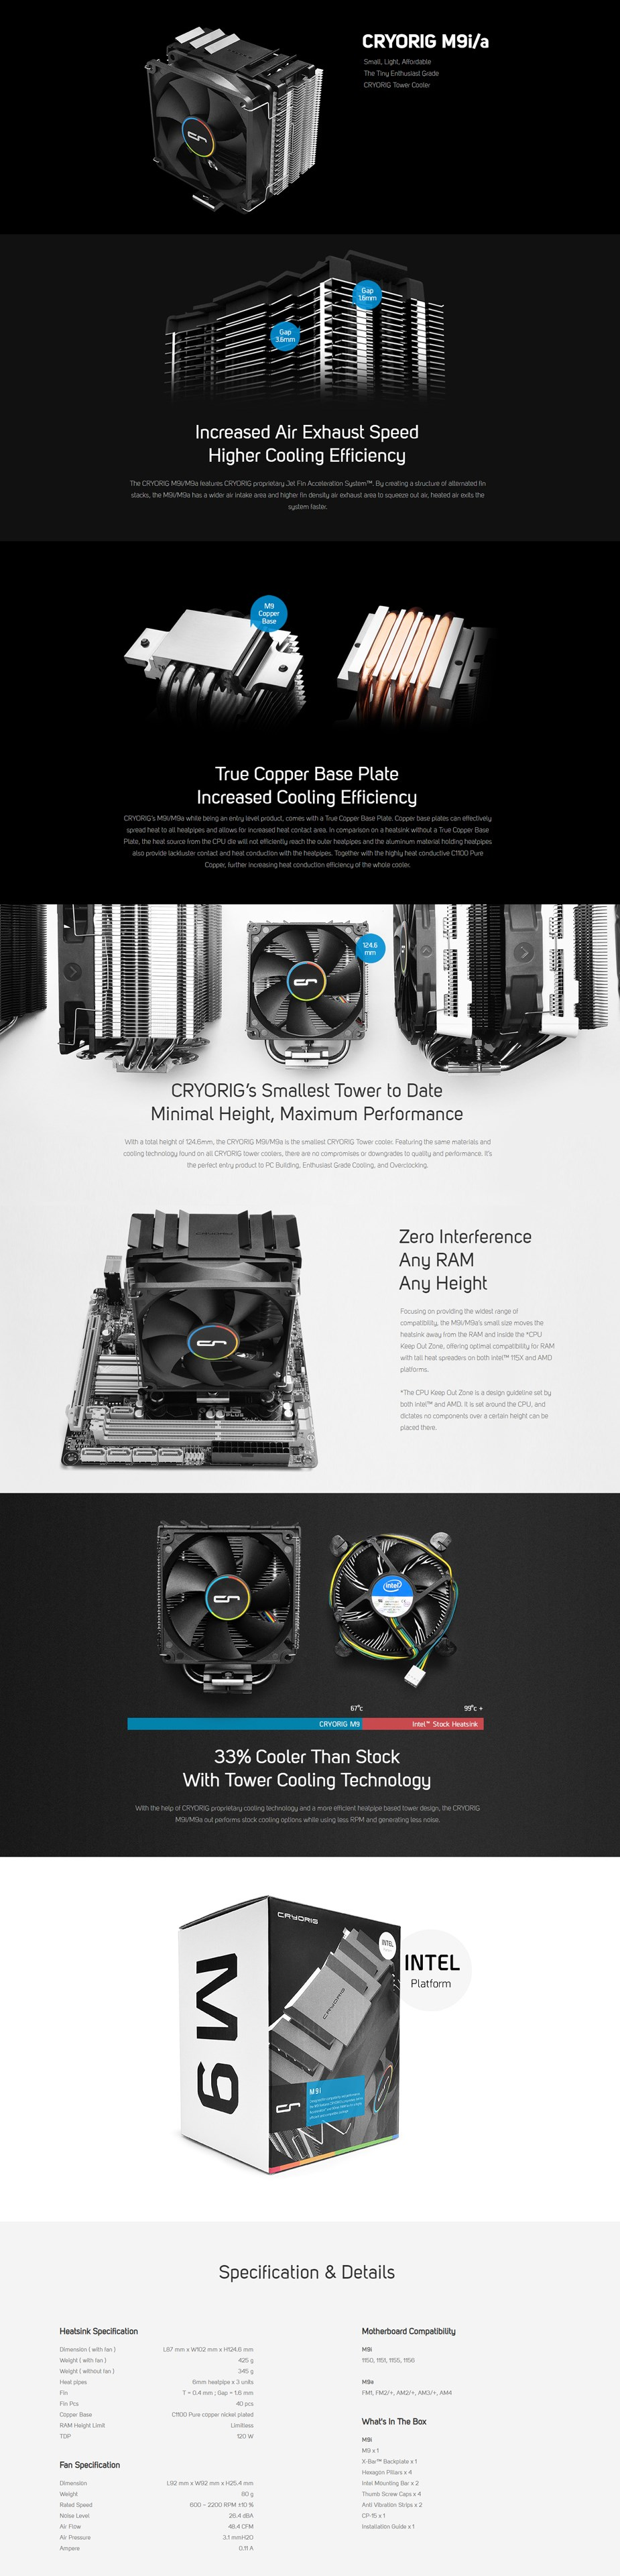 Cryorig M9i CPU Cooler - Overview 1